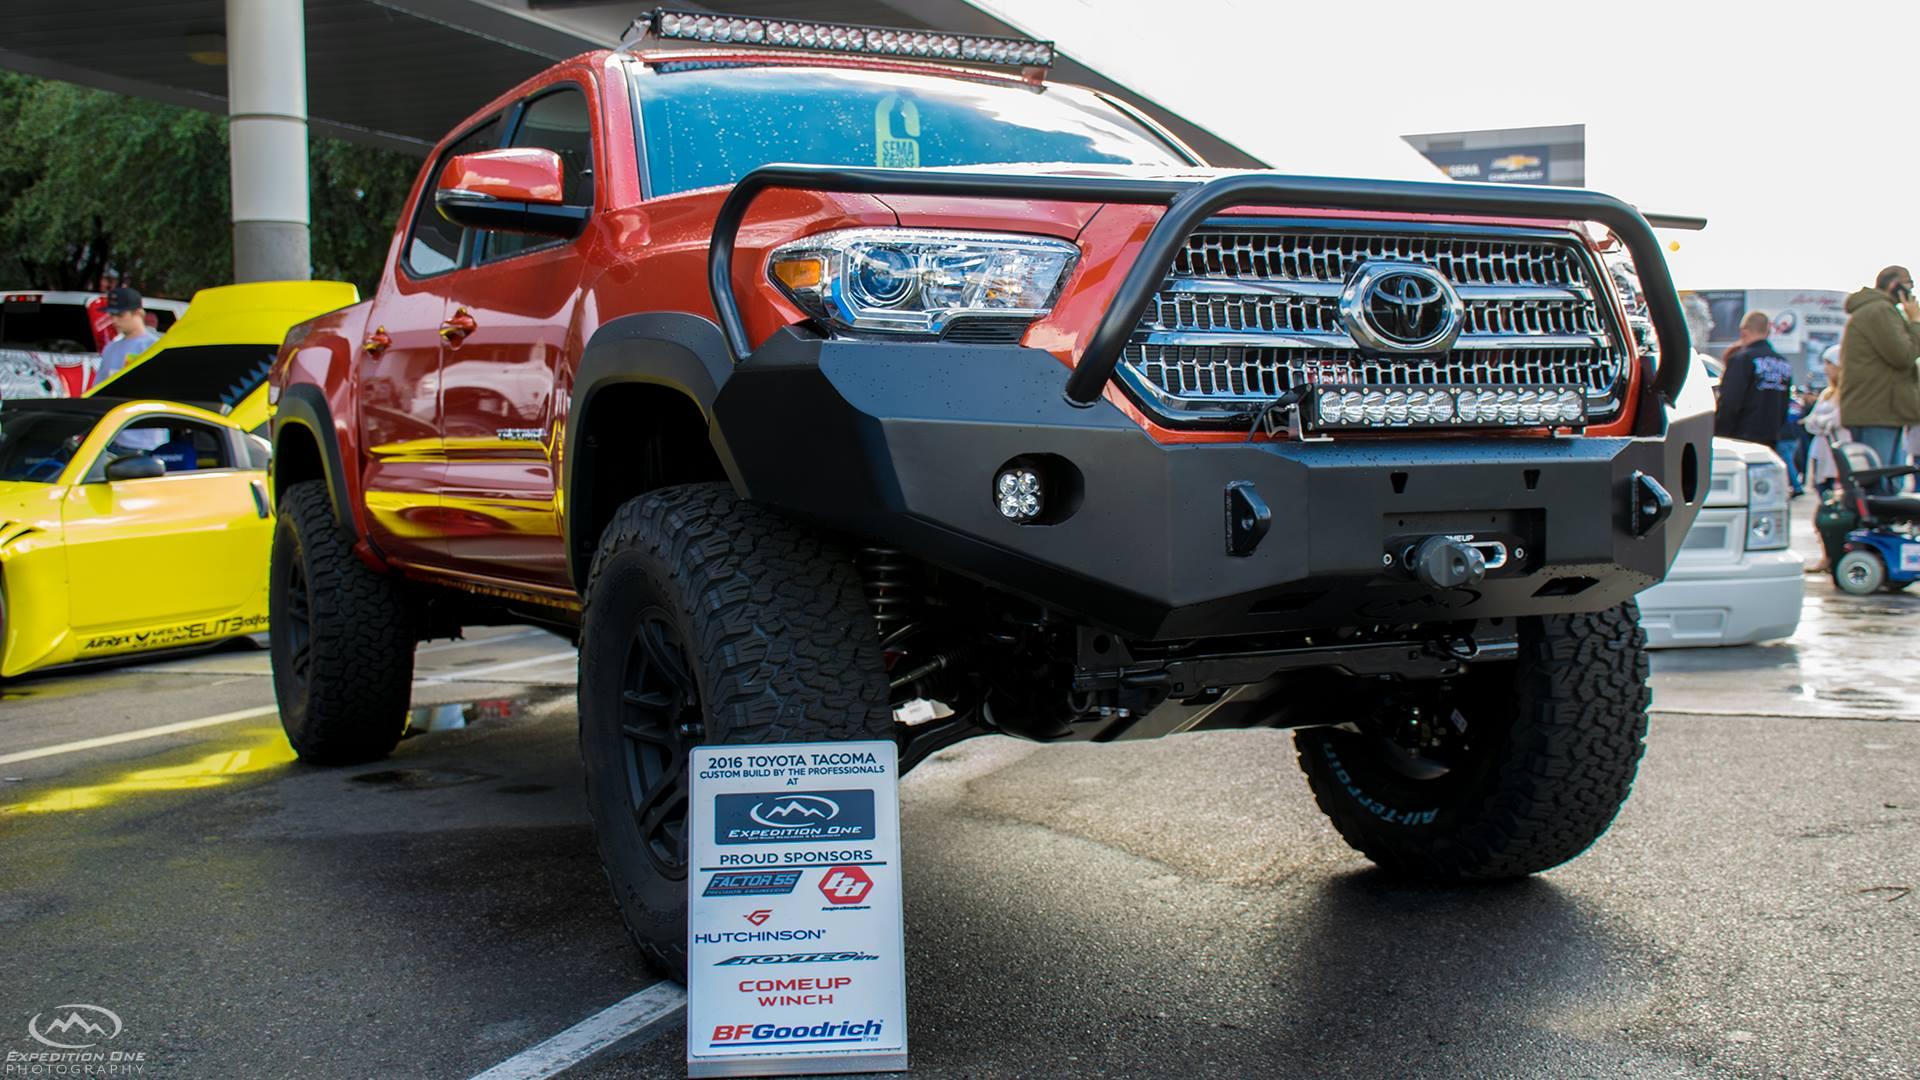 2017 Toyota Tacoma Trd Pro Review Page 5 Toyota Fj